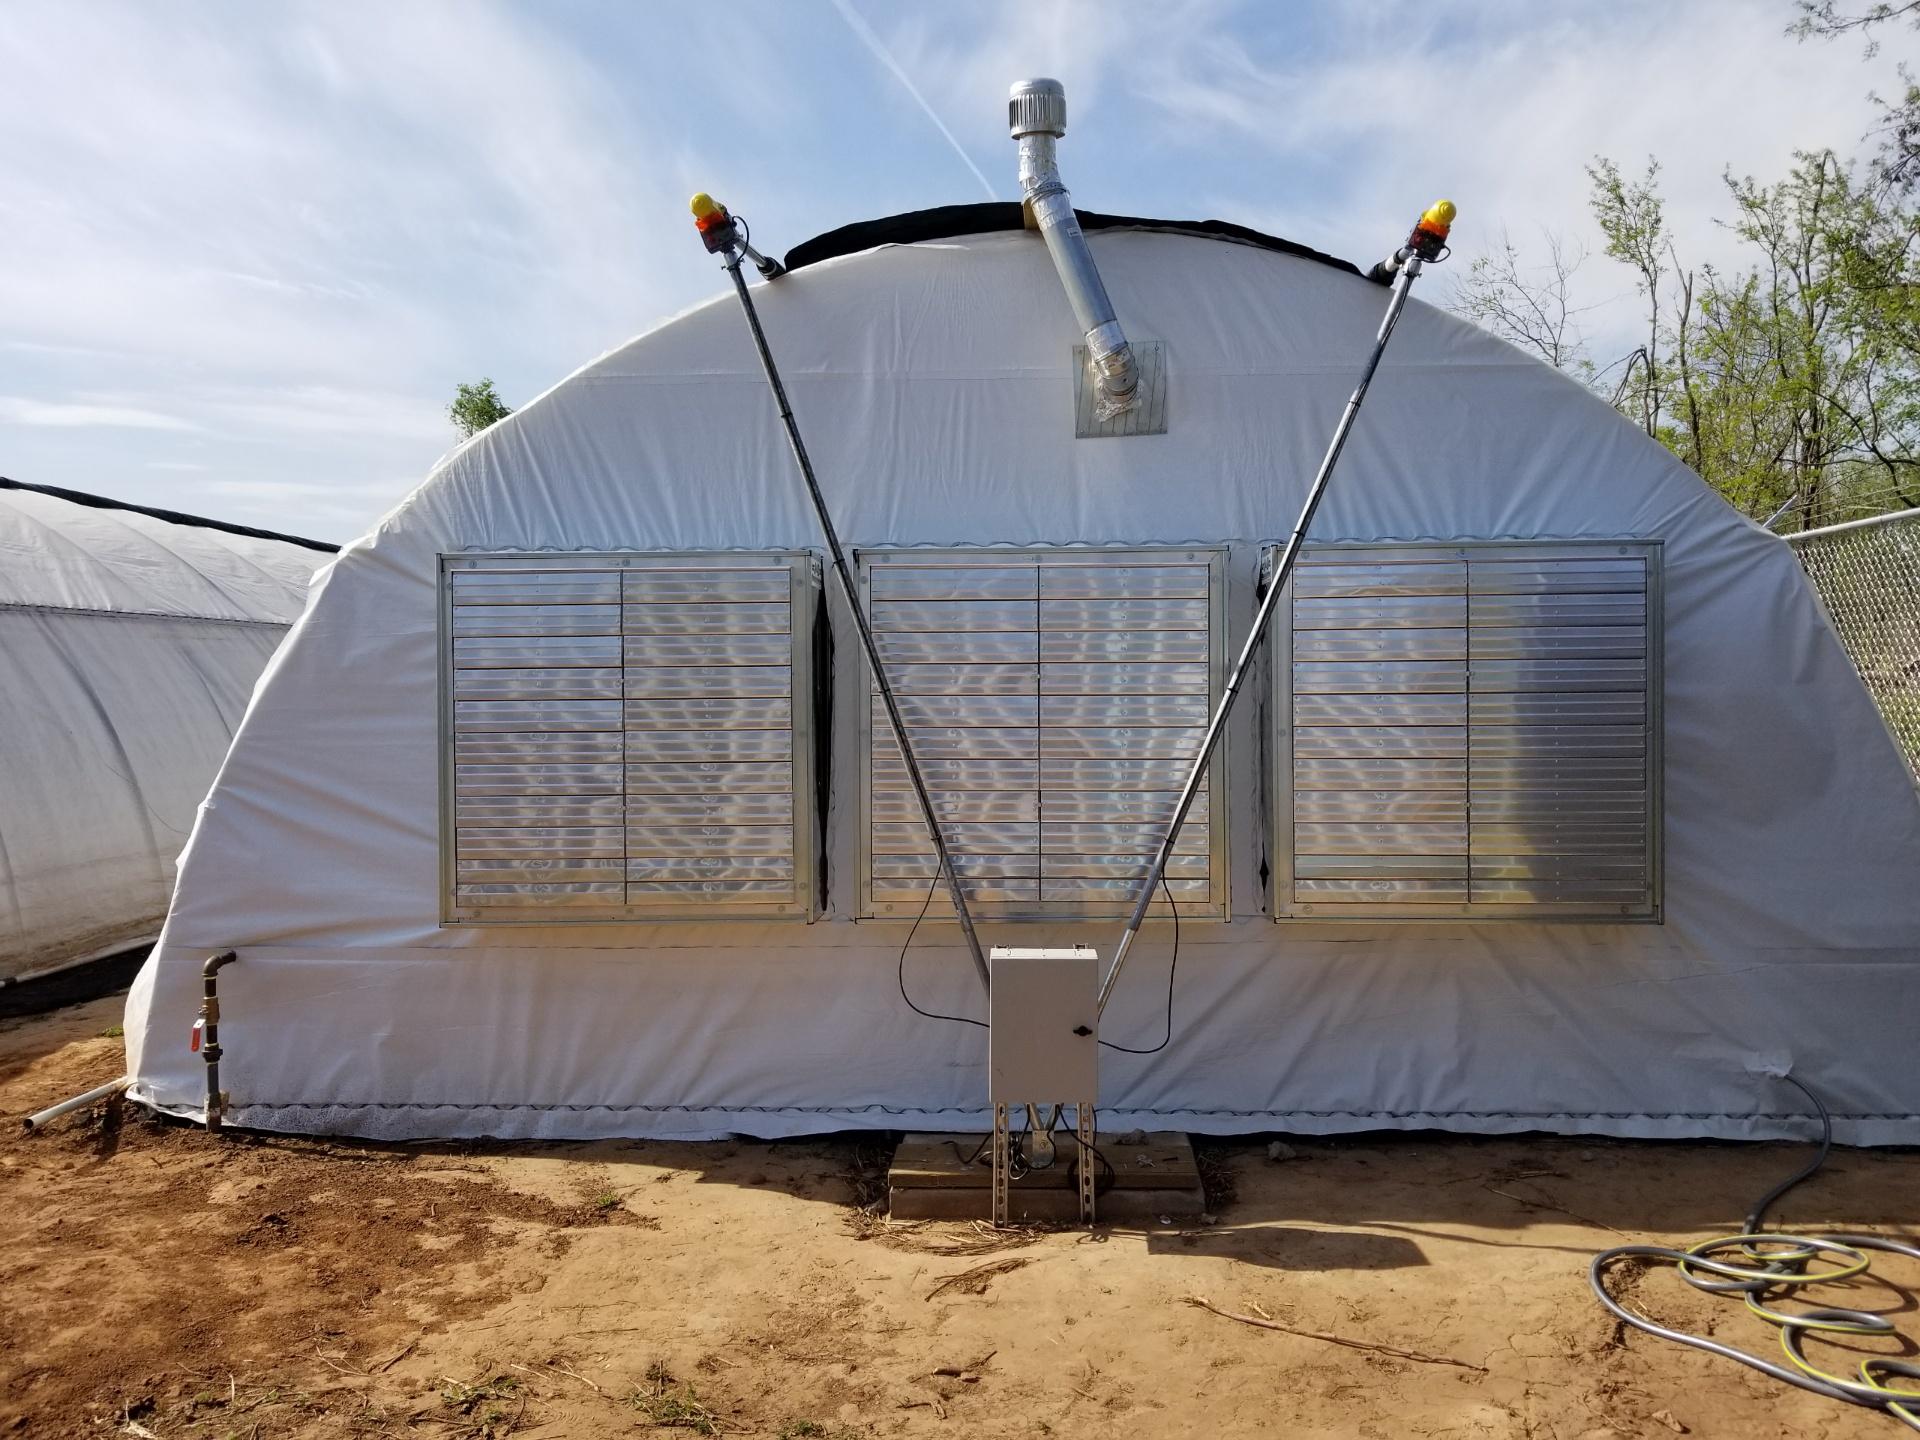 greenhouse-j-d-light-trap-intakes2-factory-fans-direct-888-849-1233.jpeg